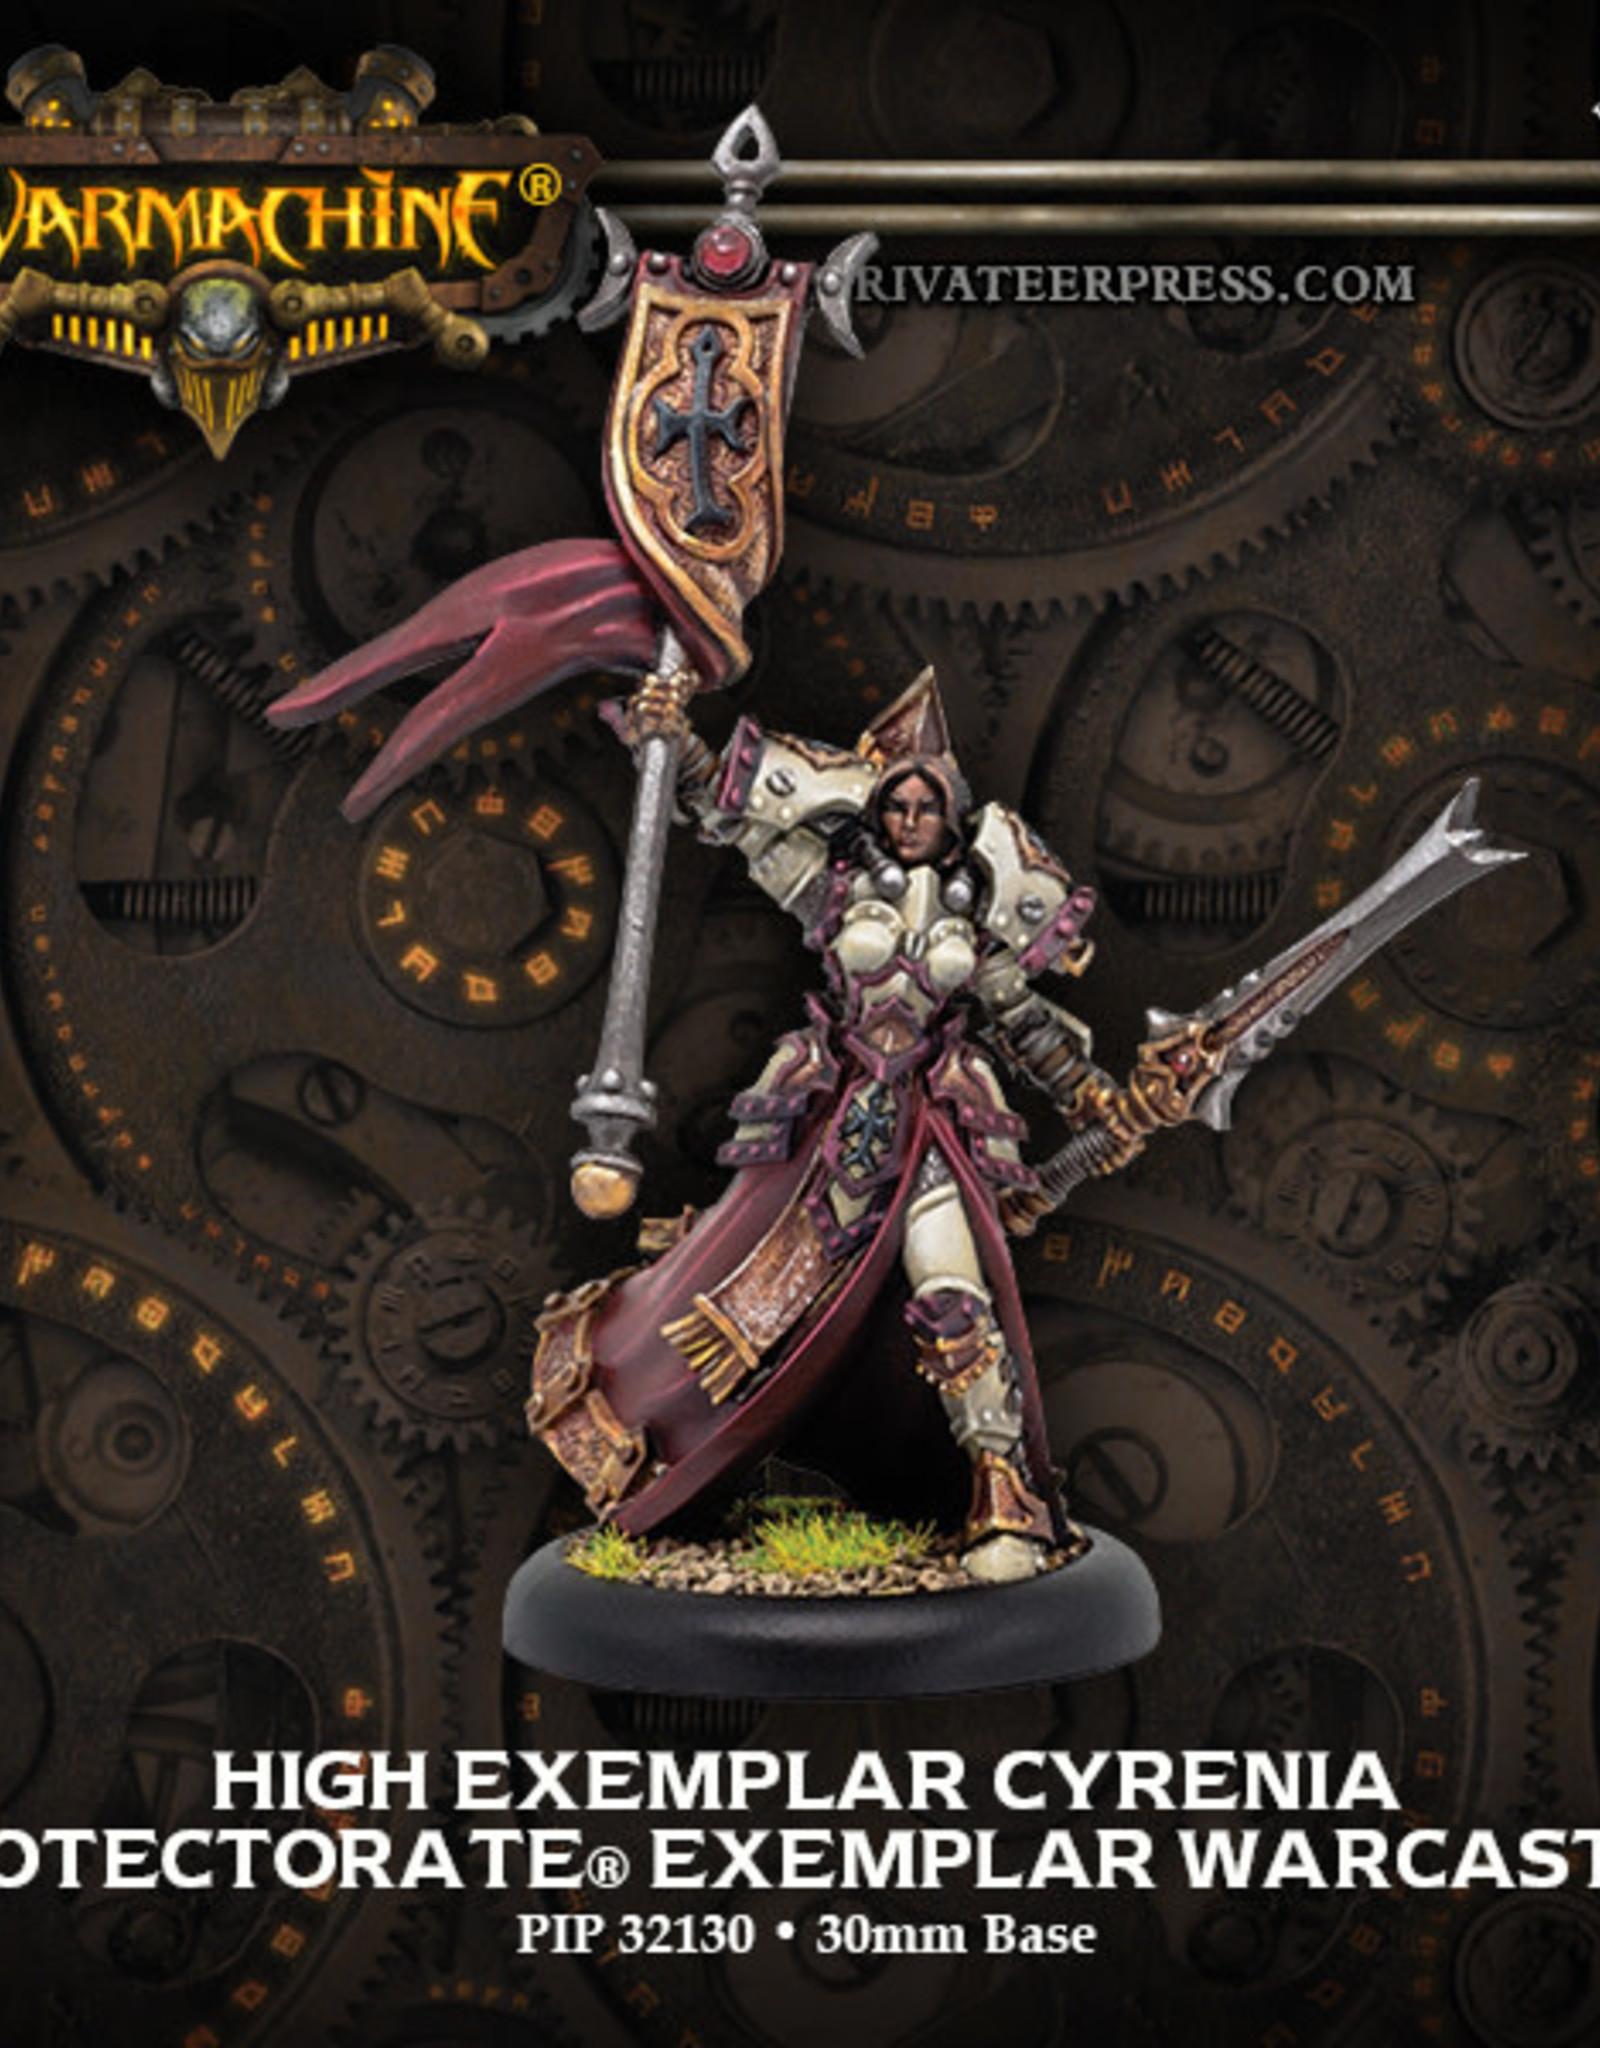 Warmachine Protectorate - High Exemplar Cyrenia